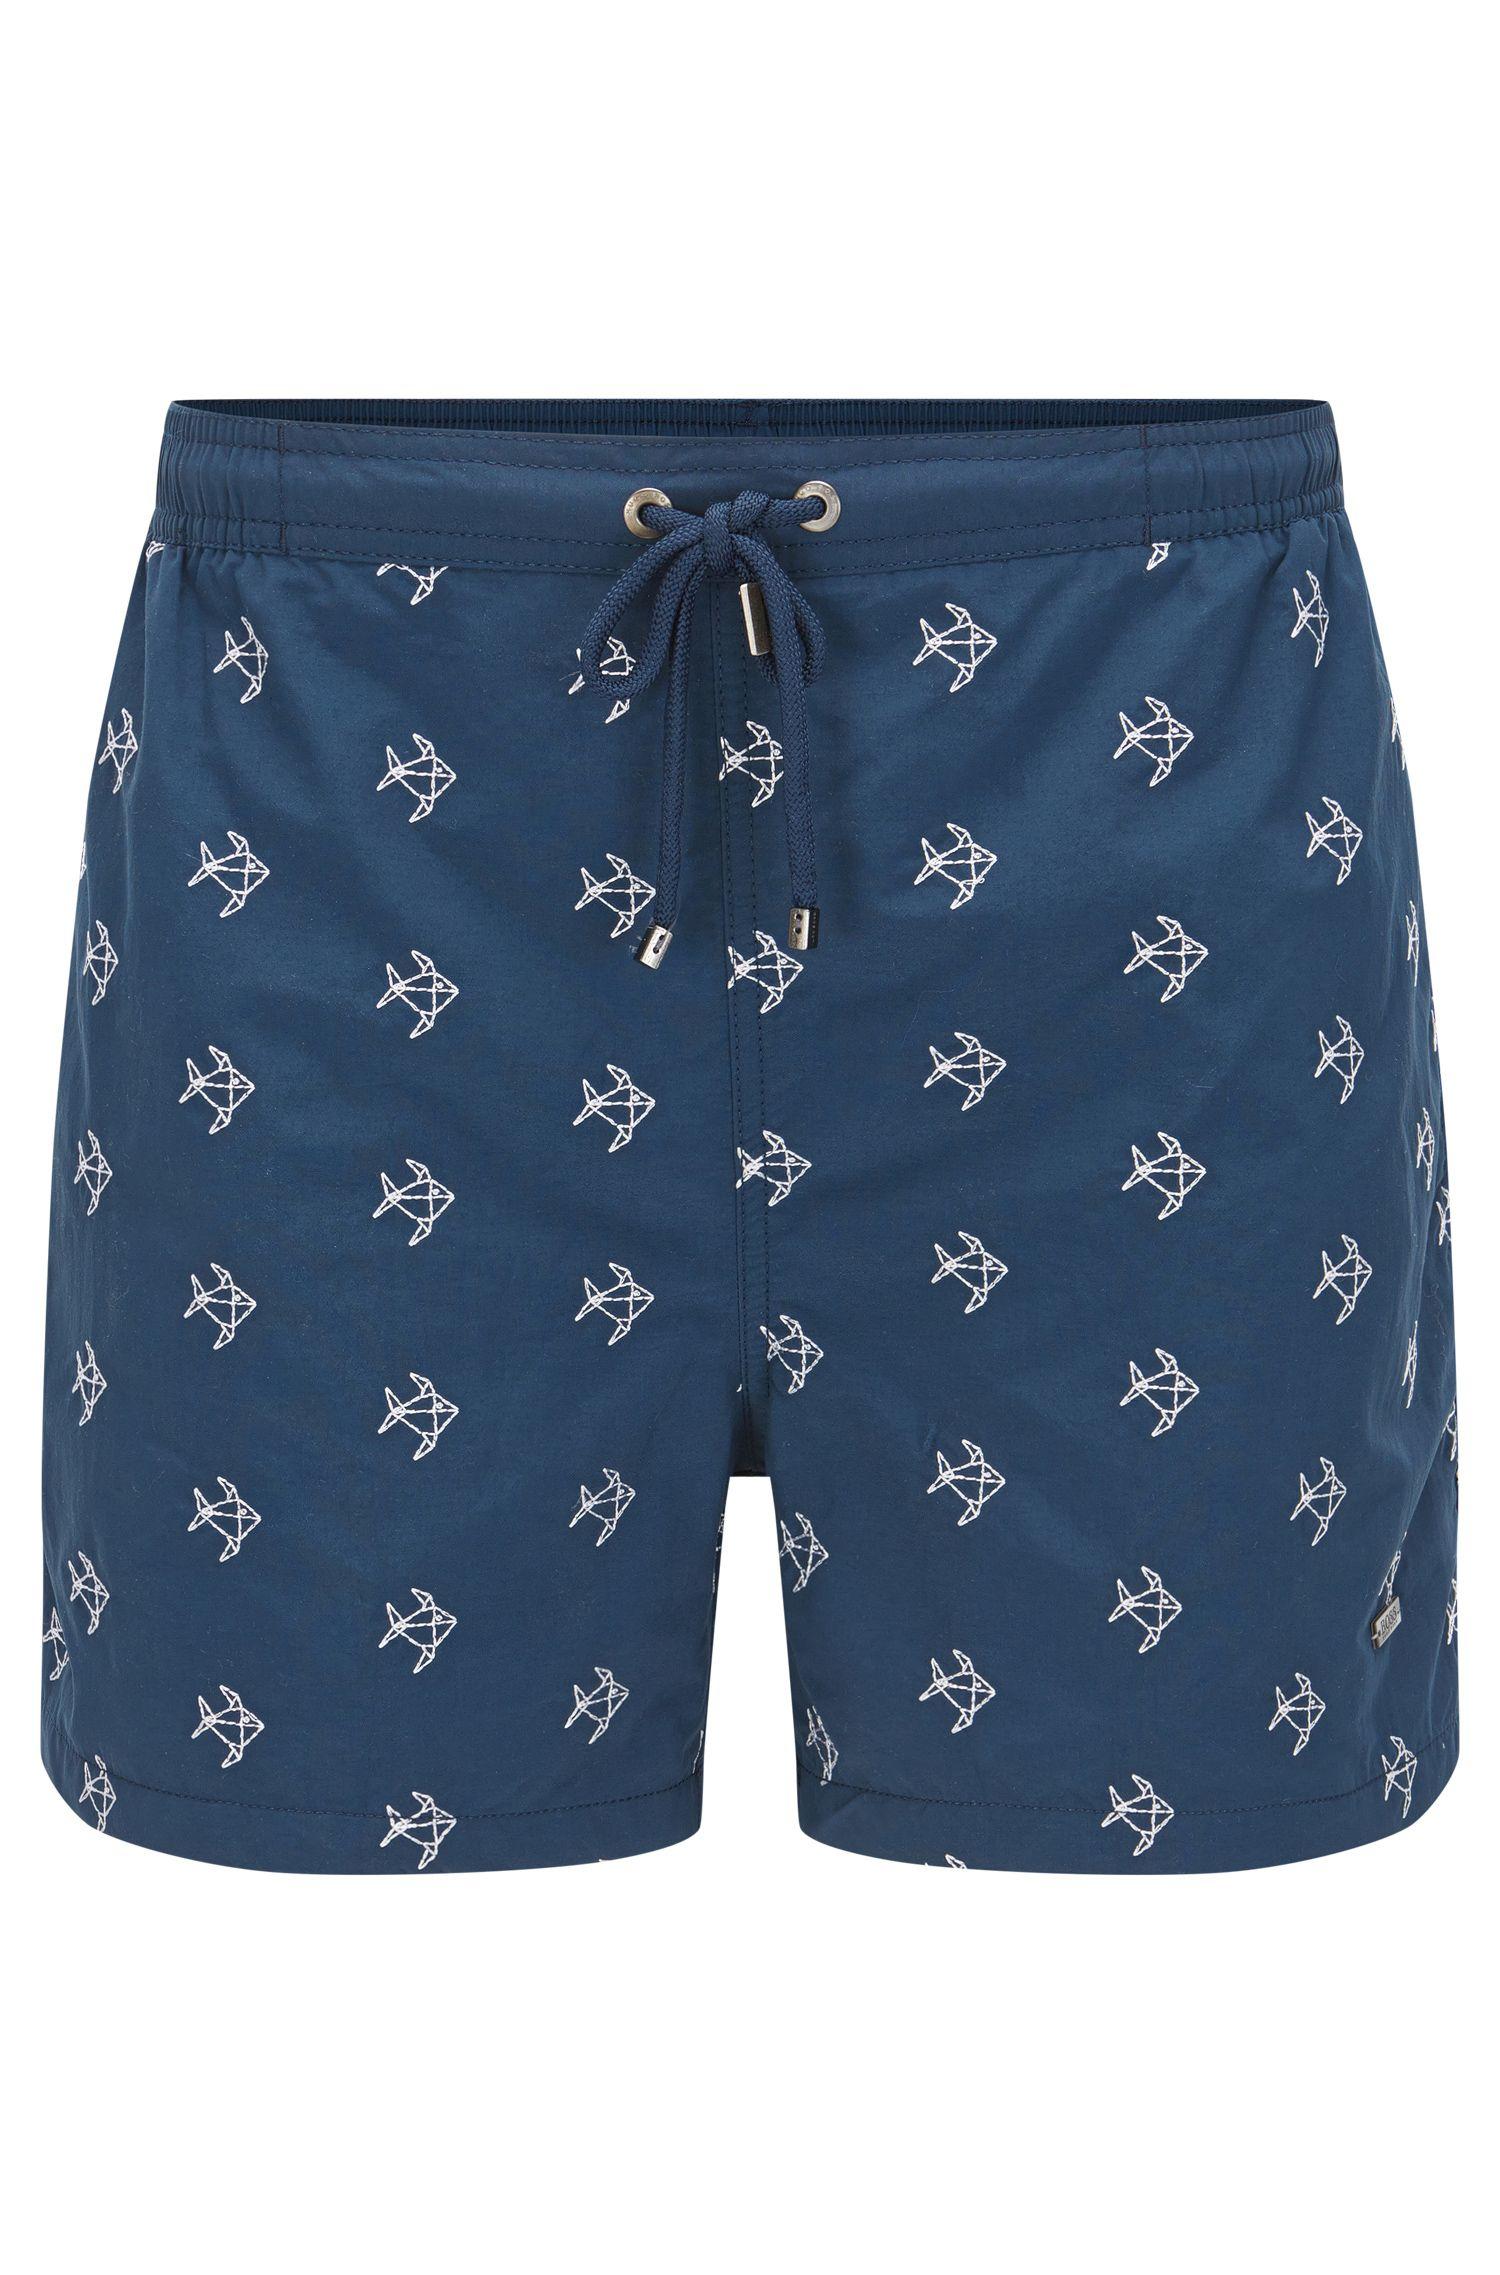 'White Shark' | Quick Dry Nylon Embroidered Swim Shorts